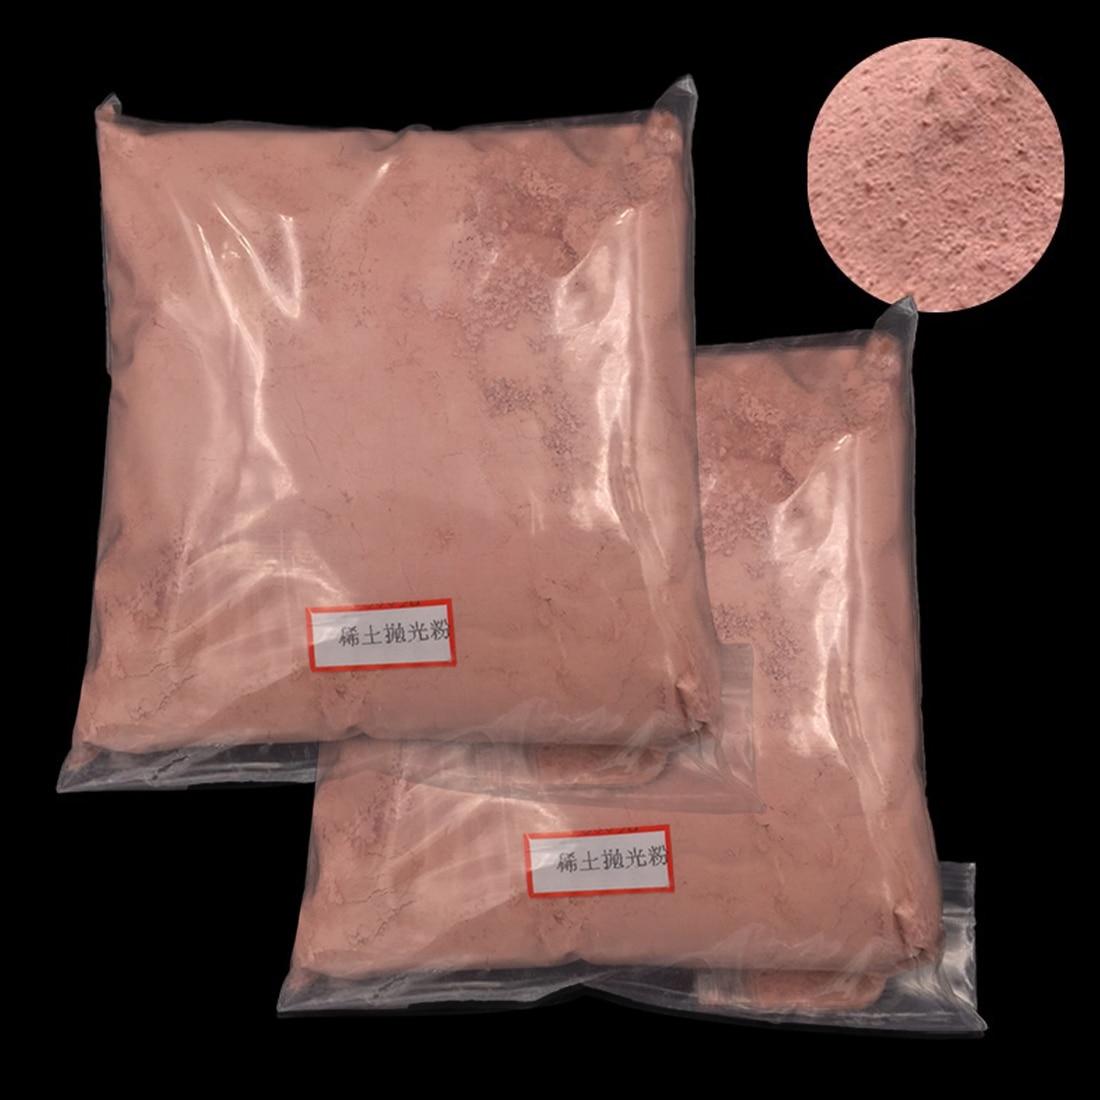 BU-Bauty  50g 100g 200g Glass Polishing Powder Oxide Cerium Composite Powder For Car Windows Car Polishing Tool